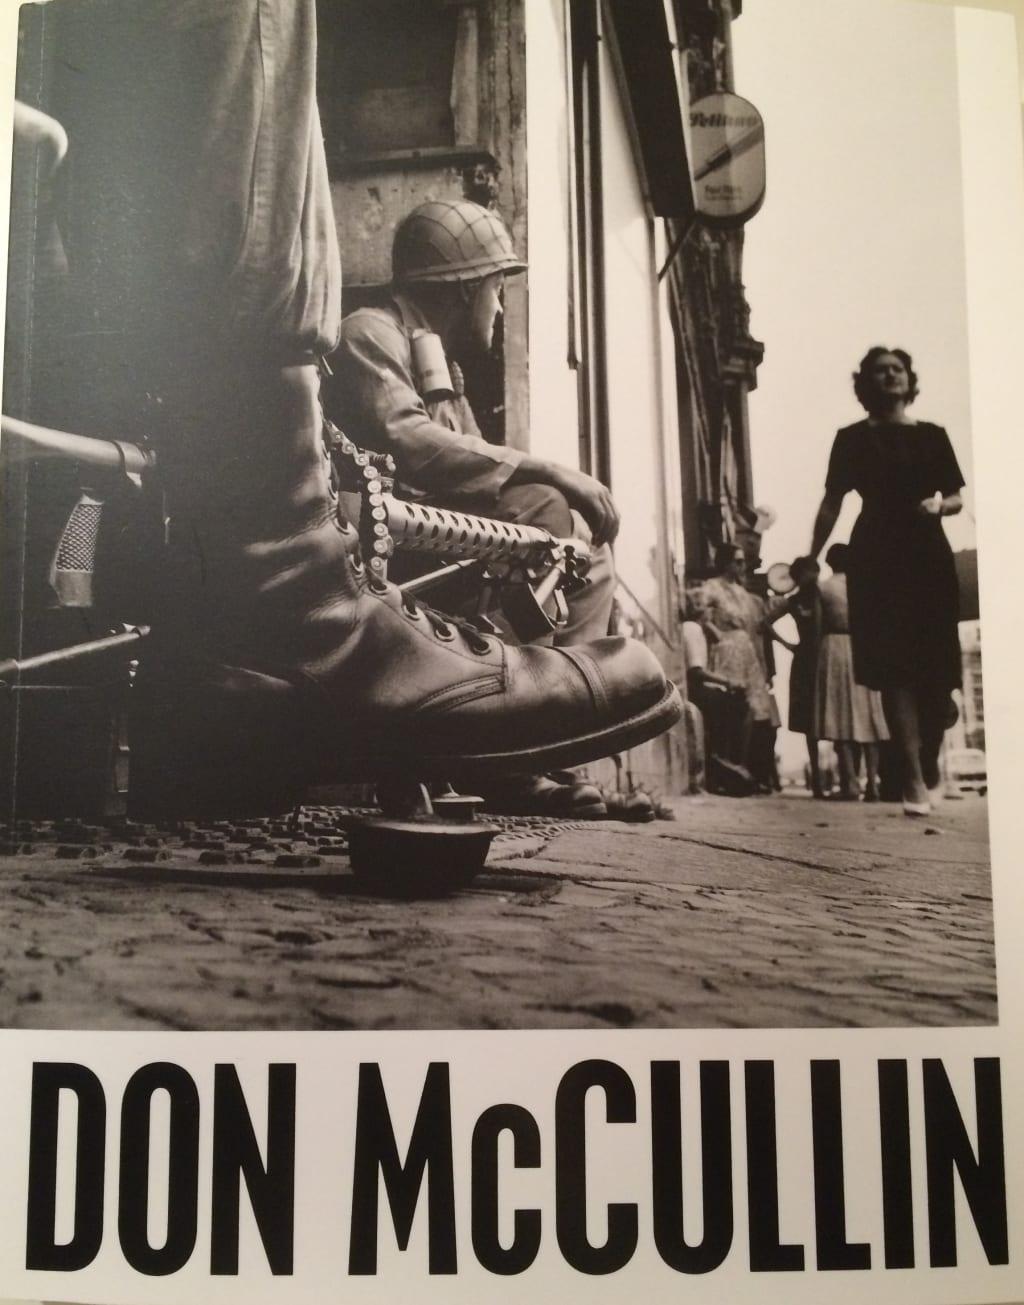 Don McCullin at Tate Britain